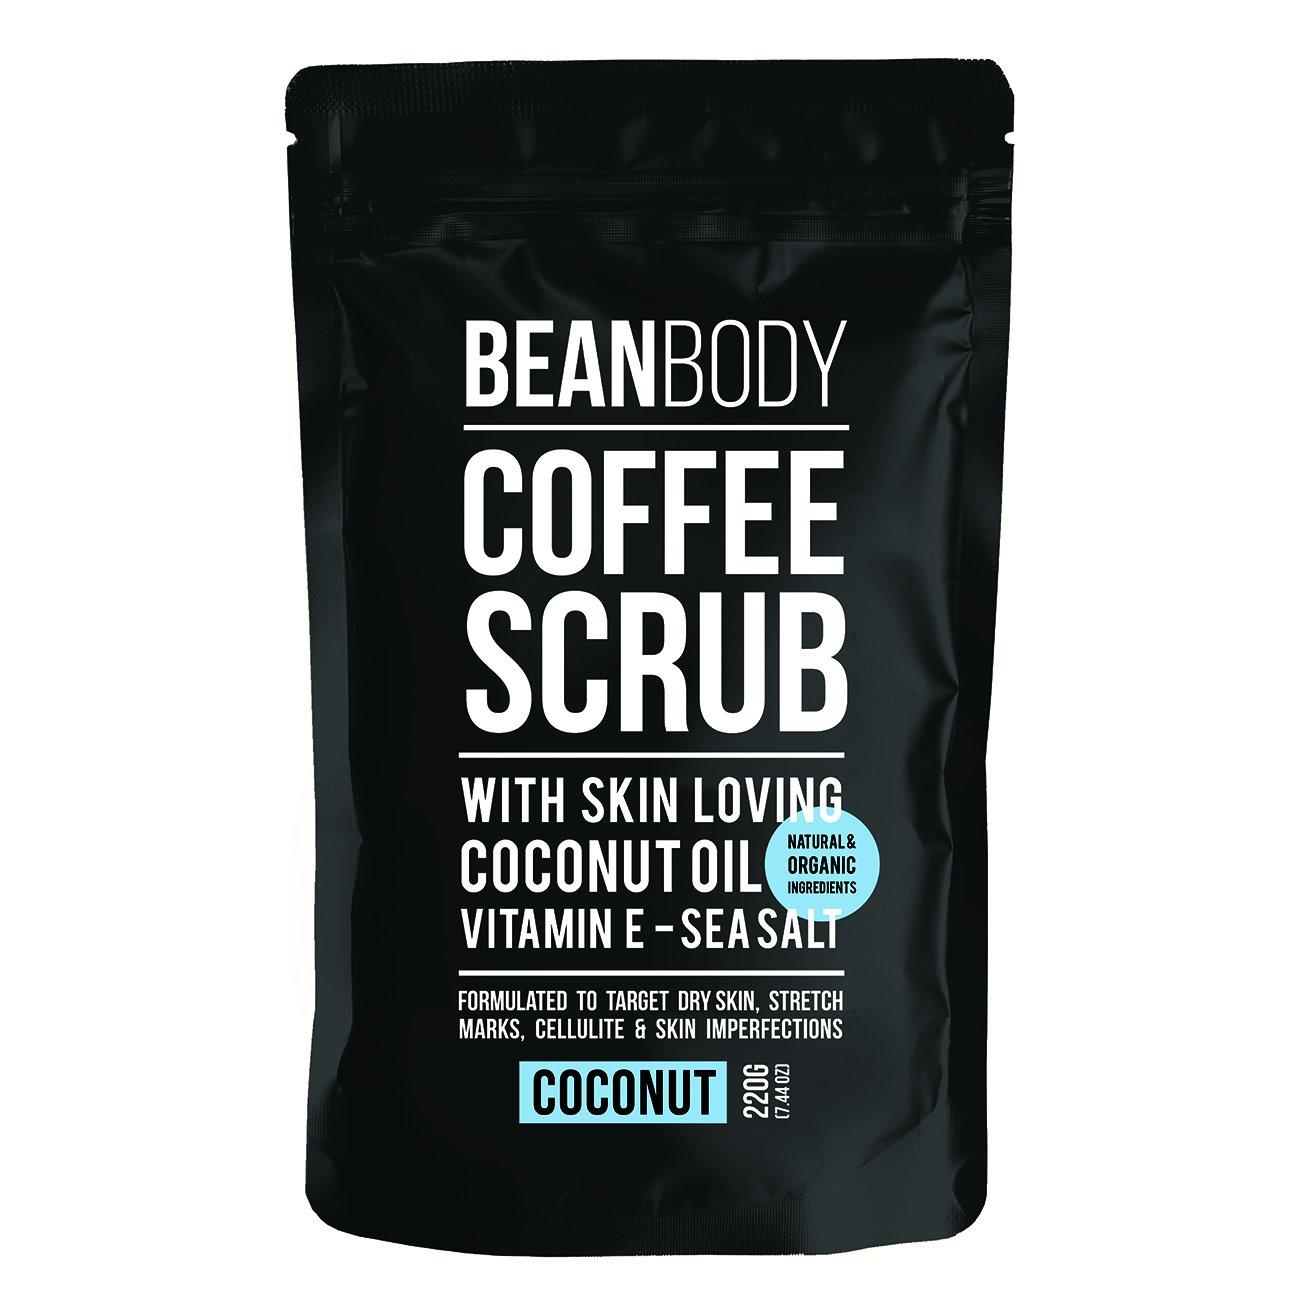 Mr. Bean Organic All Natural Coffee Bean Exfoliating Body Skin Scrub with Coconut Oil, Vitamin E, and Sea Salt- Coconut Mr Bean Body Care